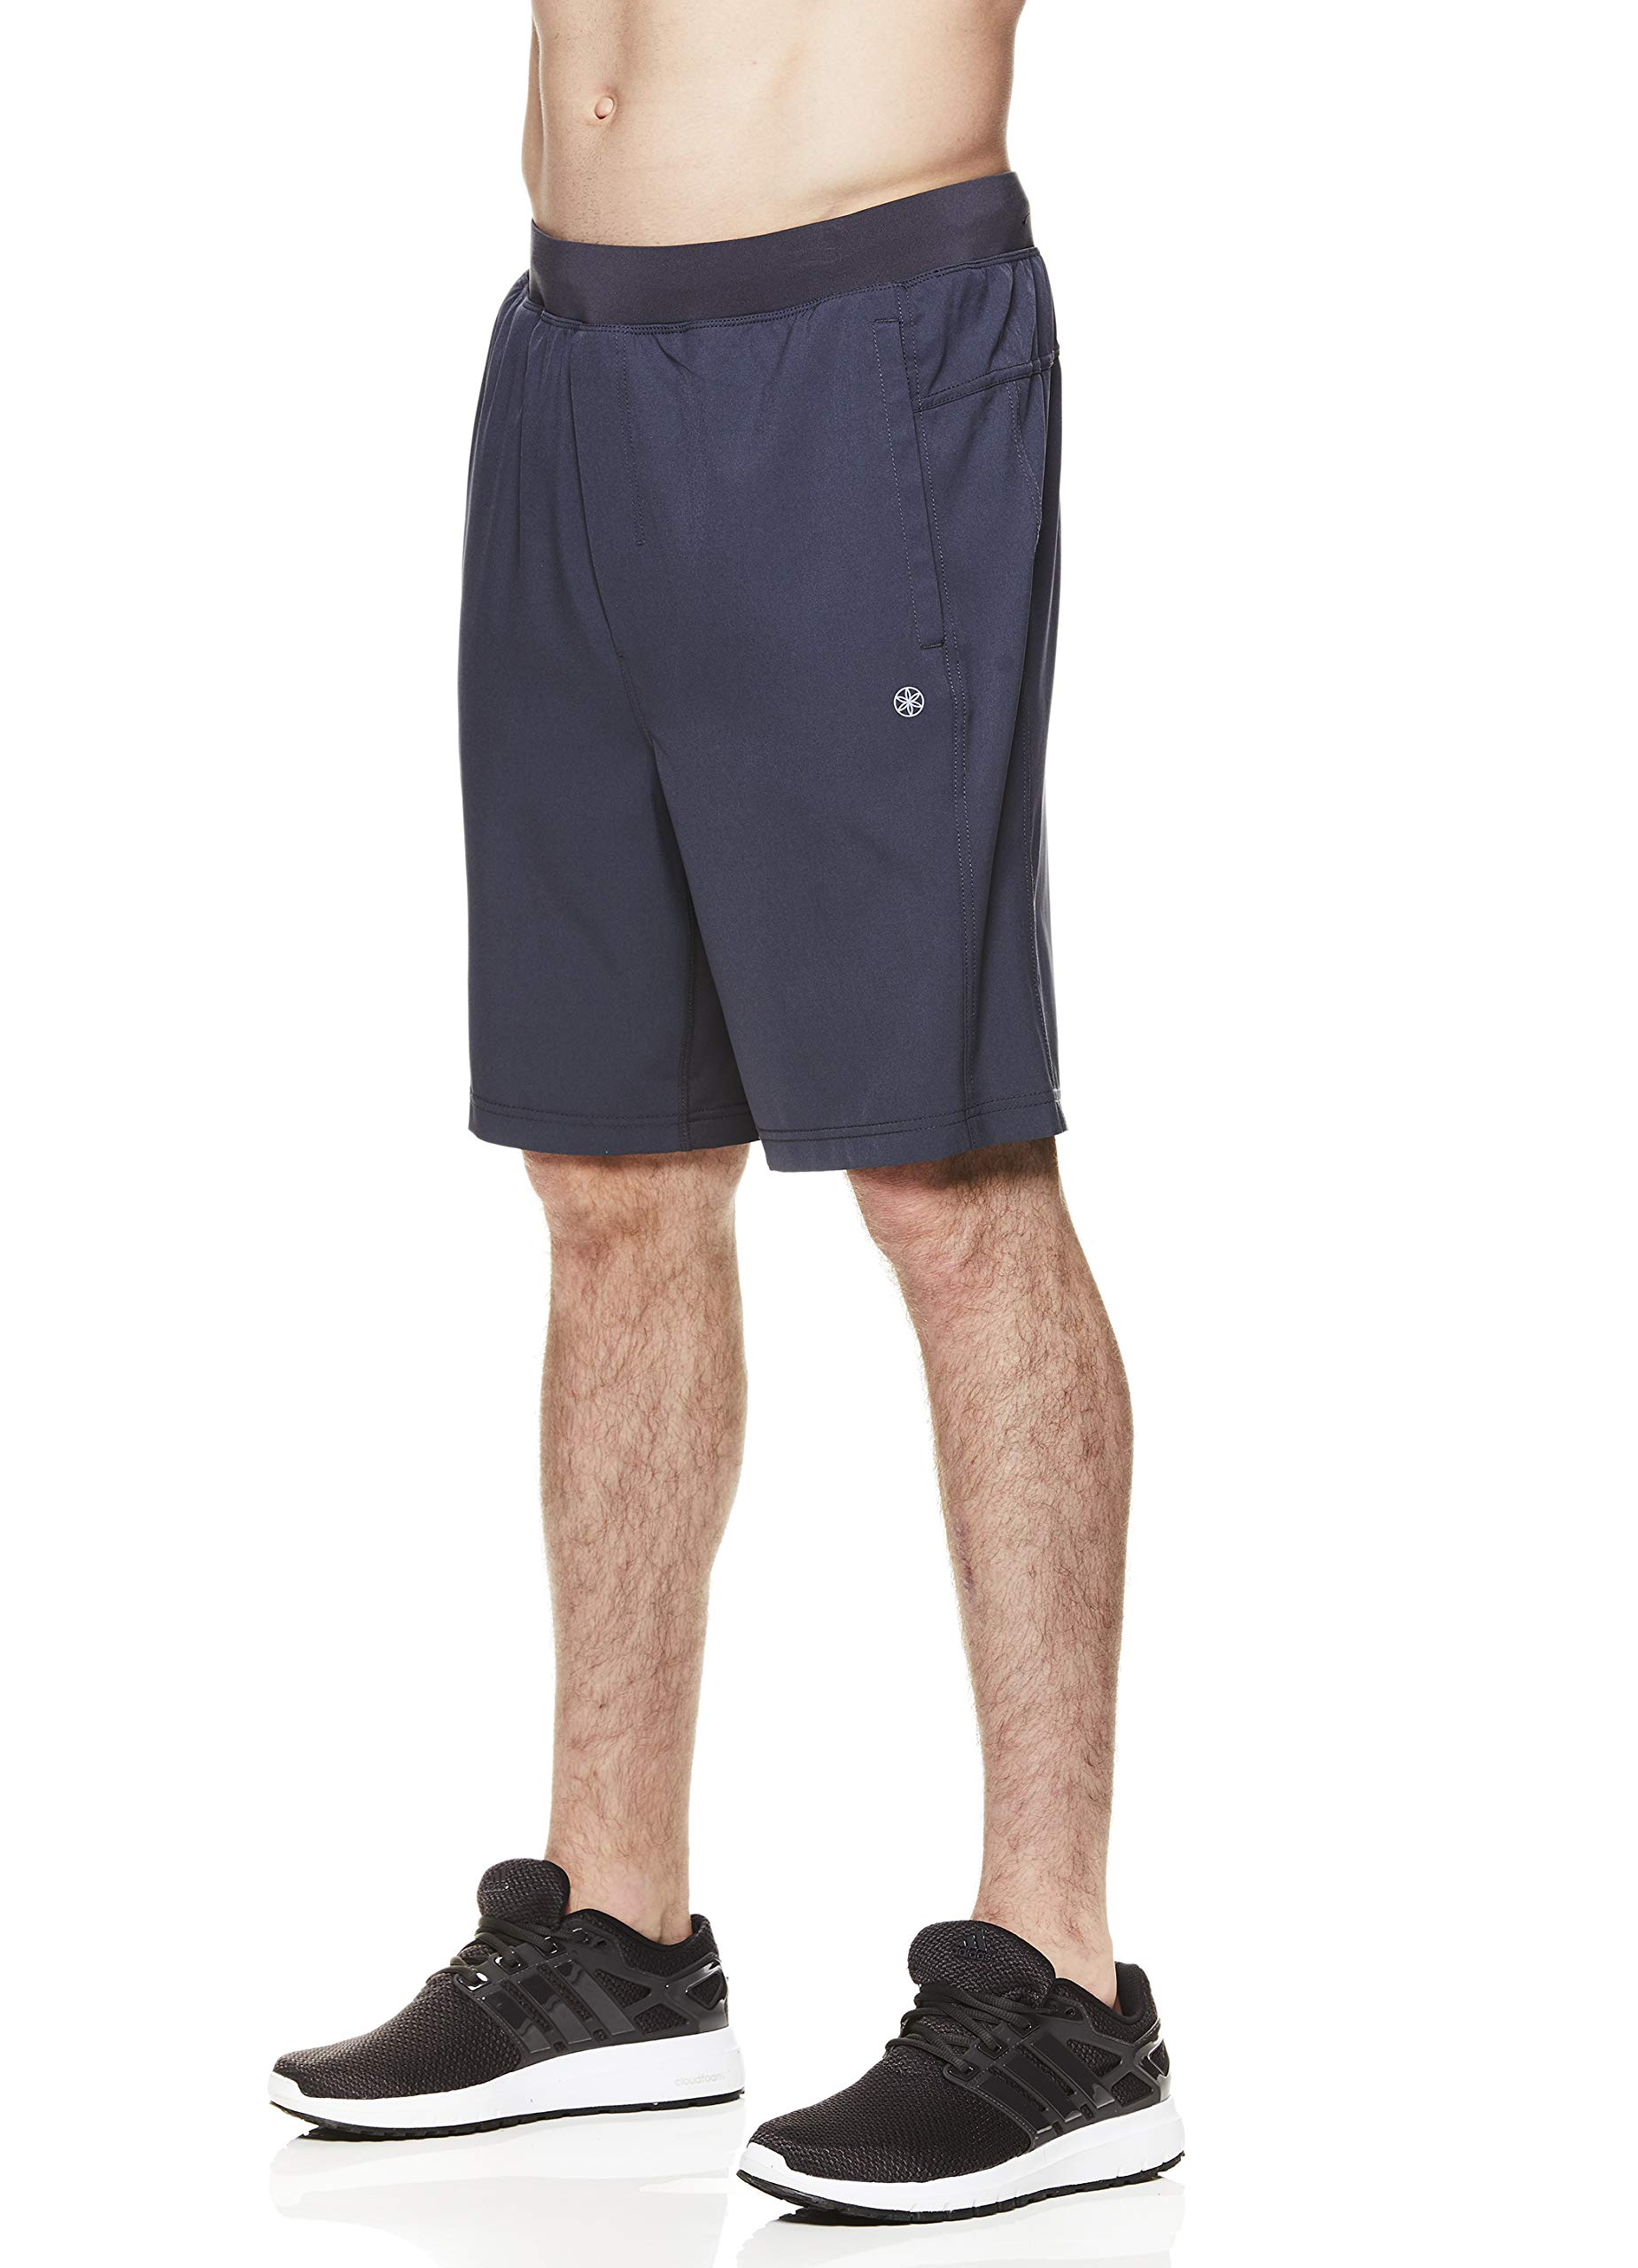 Gaiam Men's Yoga Shorts - Performance Heather Gym & Workout Short w/Pockets - Posture Woven Ebony, Small